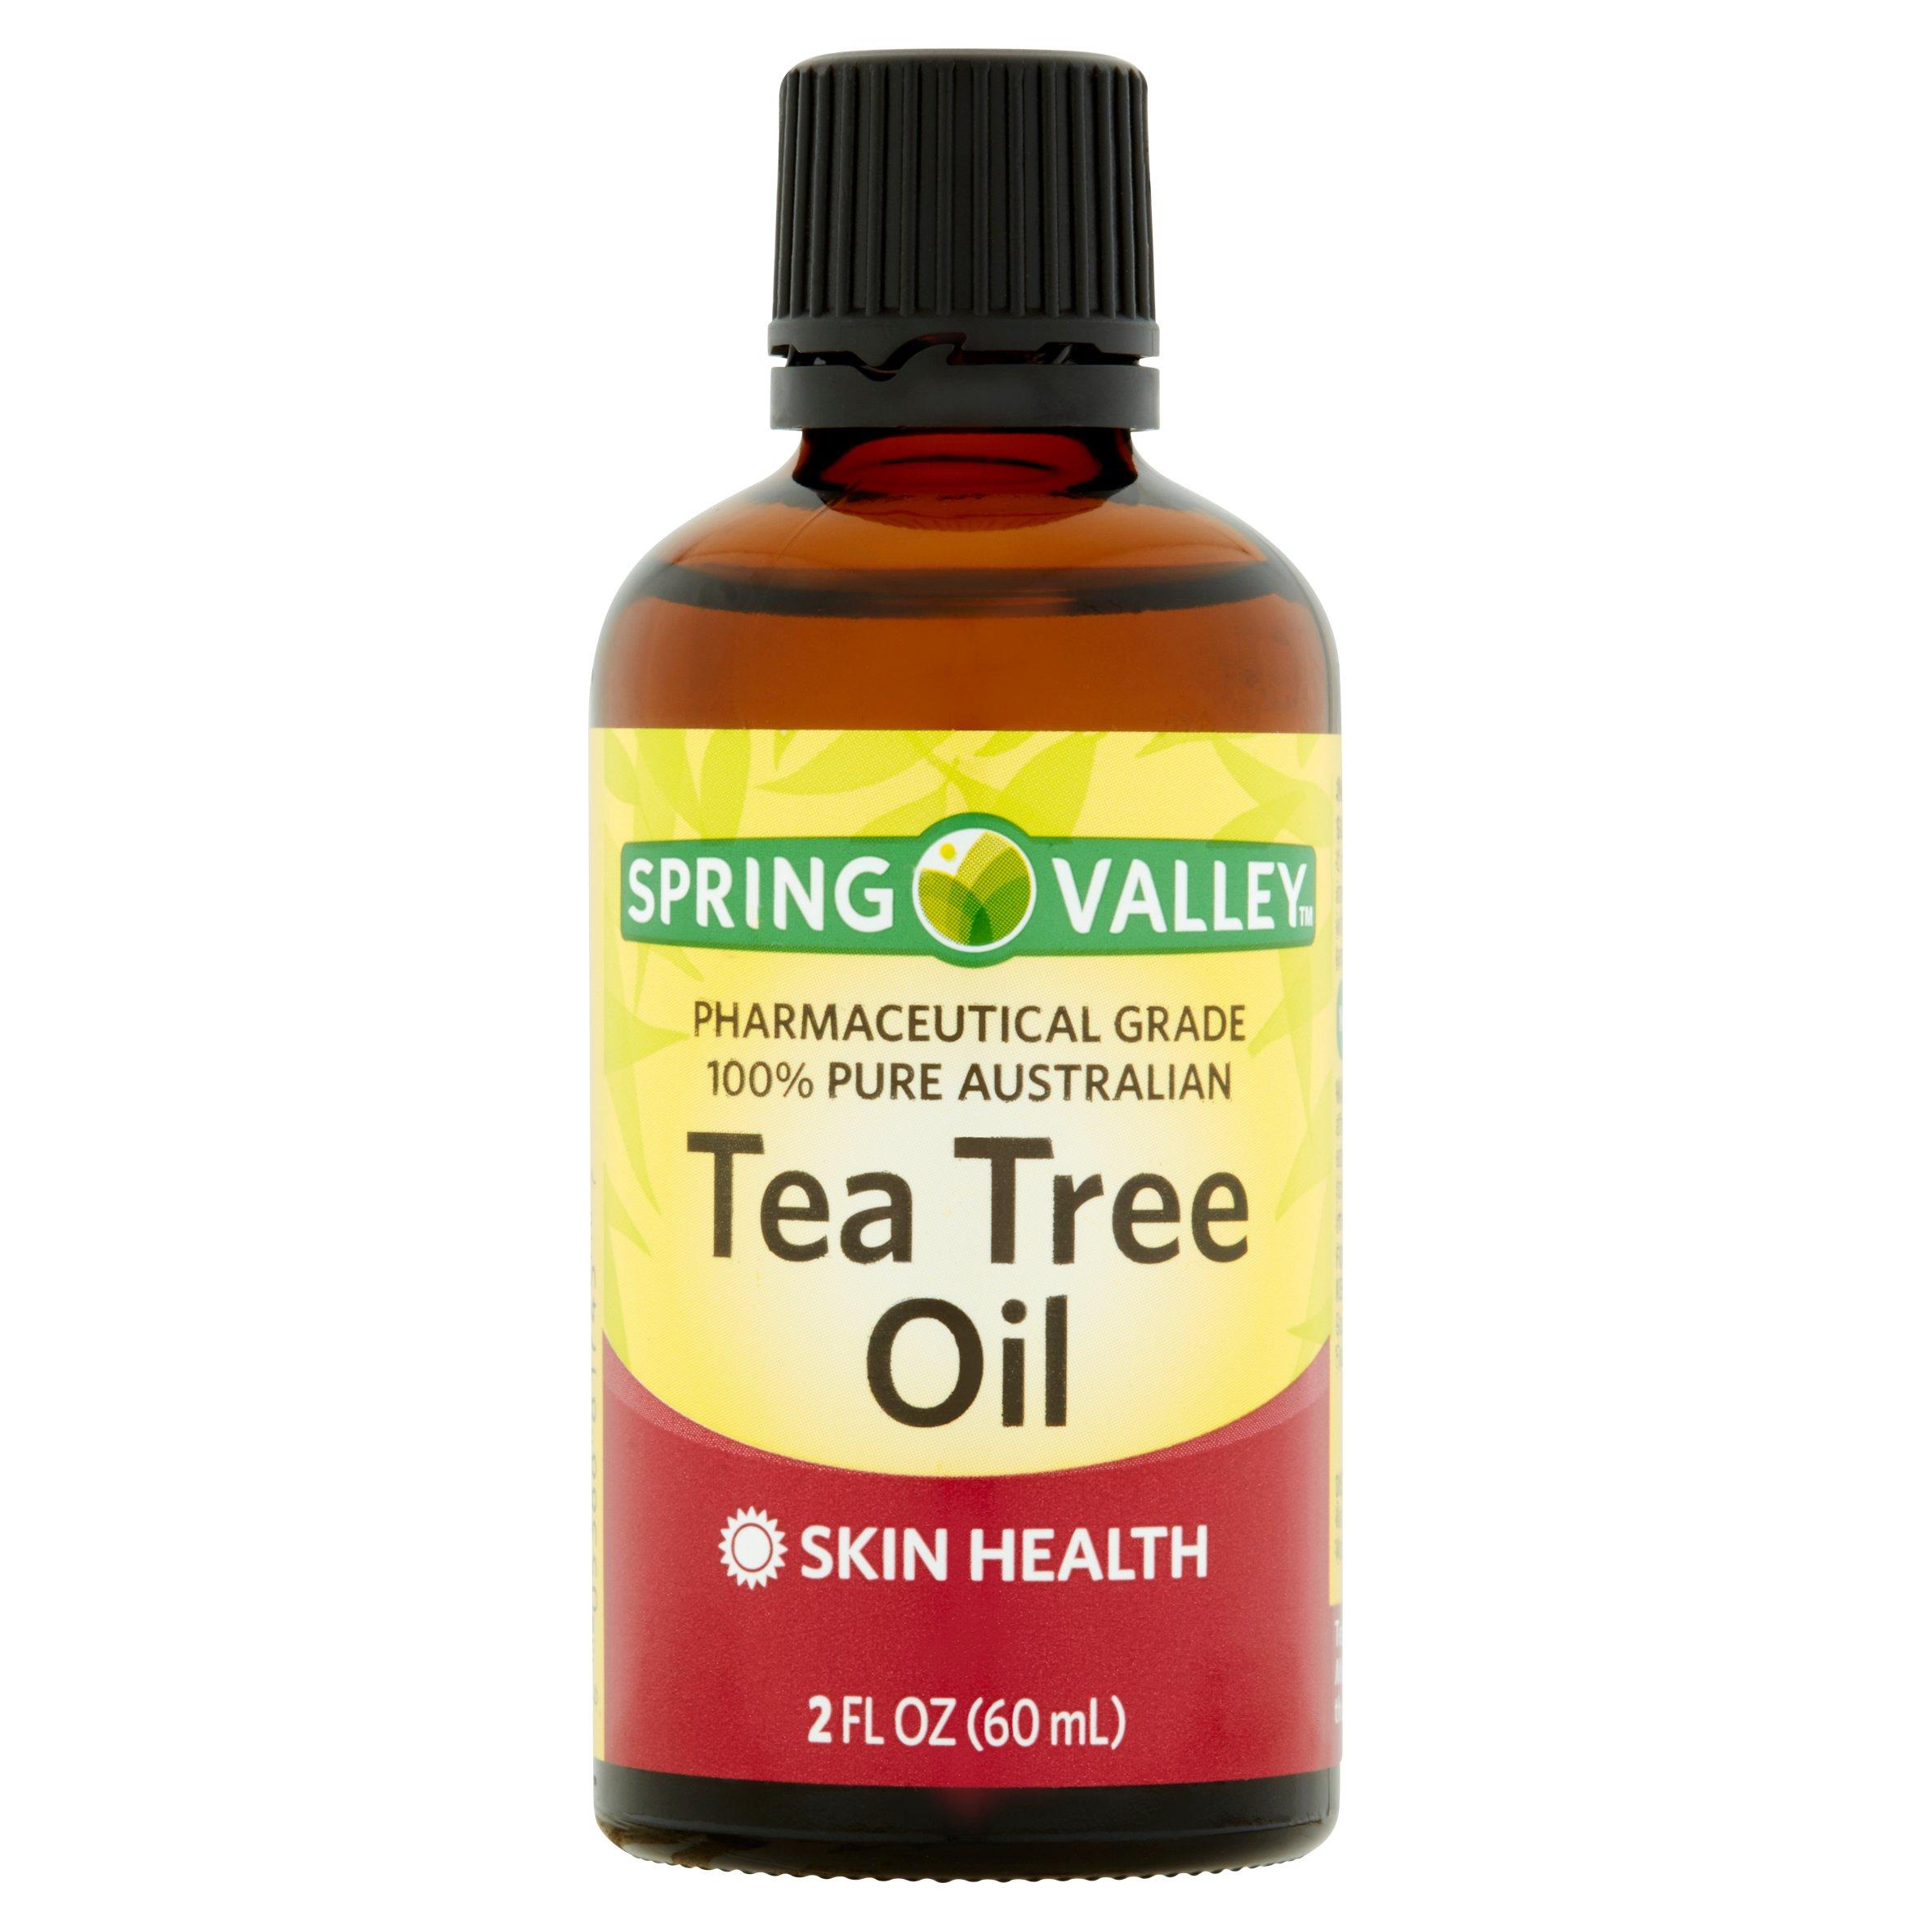 Spring Valley Tea Tree Oil 2fl oz